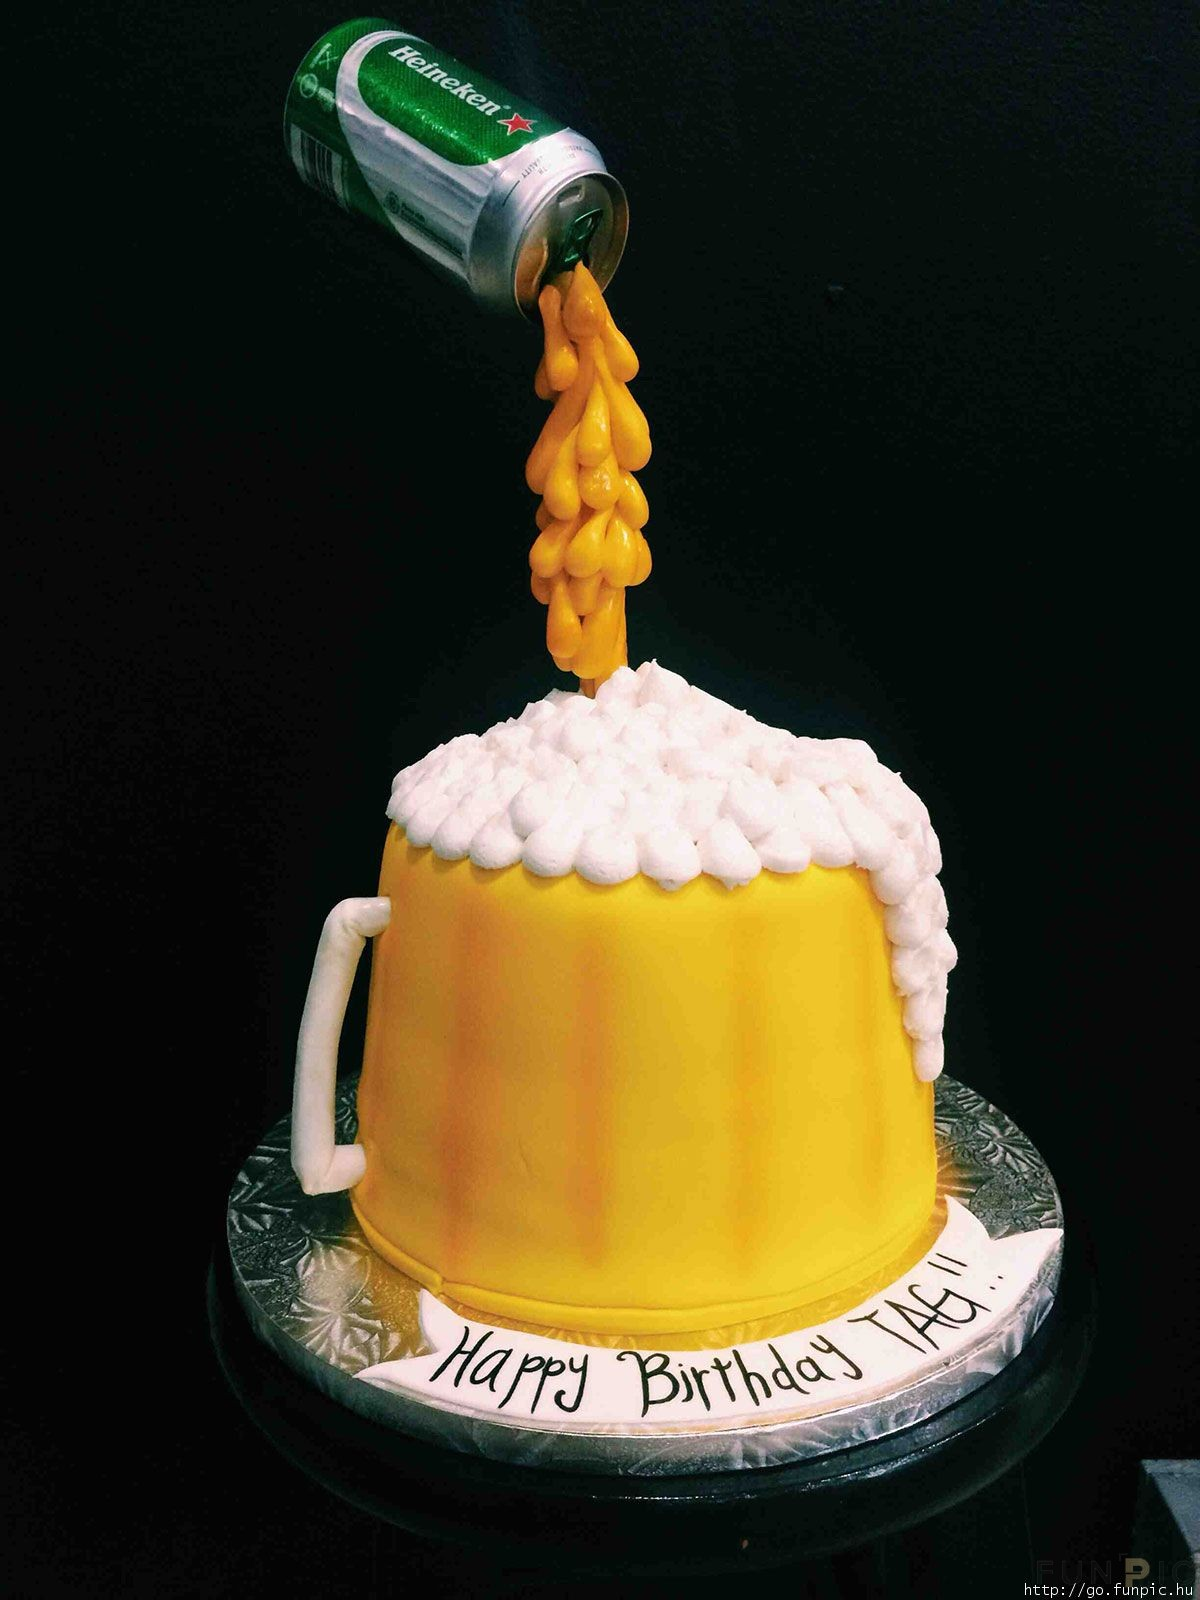 Admirable Beer Birthday Cake Funpic Hu Funny Birthday Cards Online Elaedamsfinfo